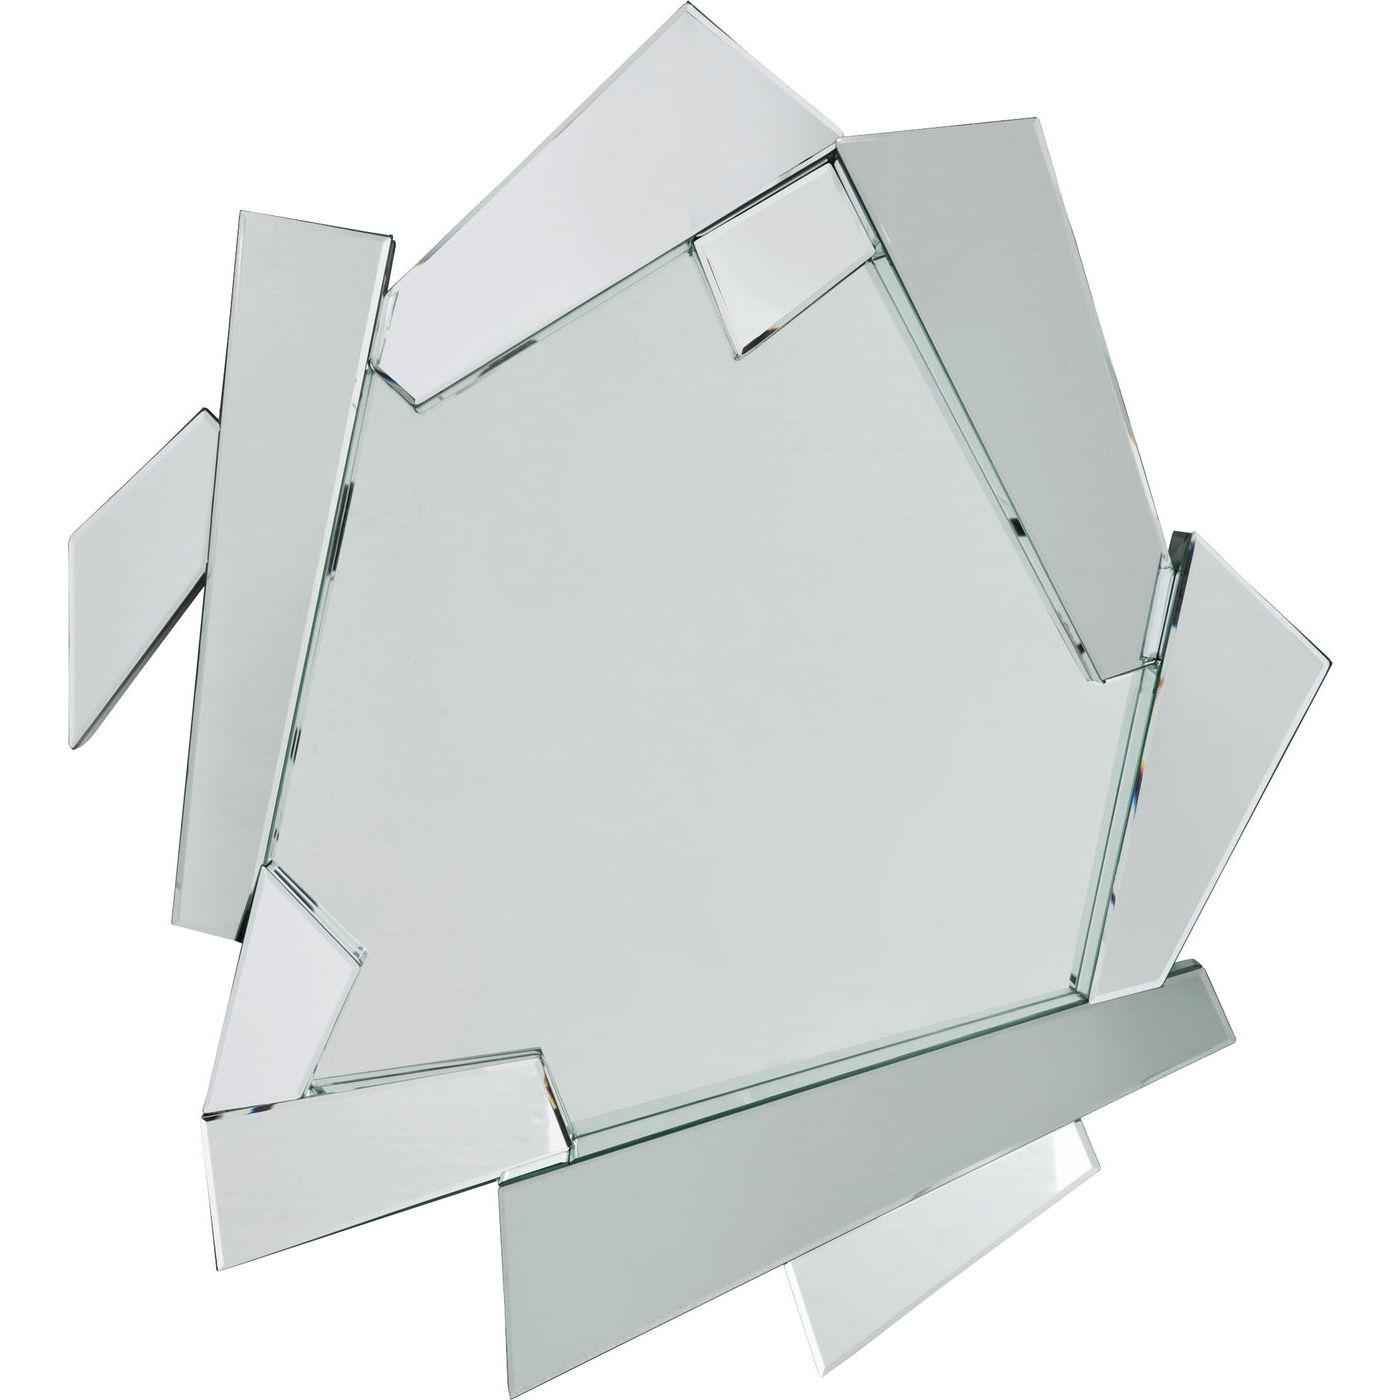 KARE DESIGN Spejl, Module 116x107cm